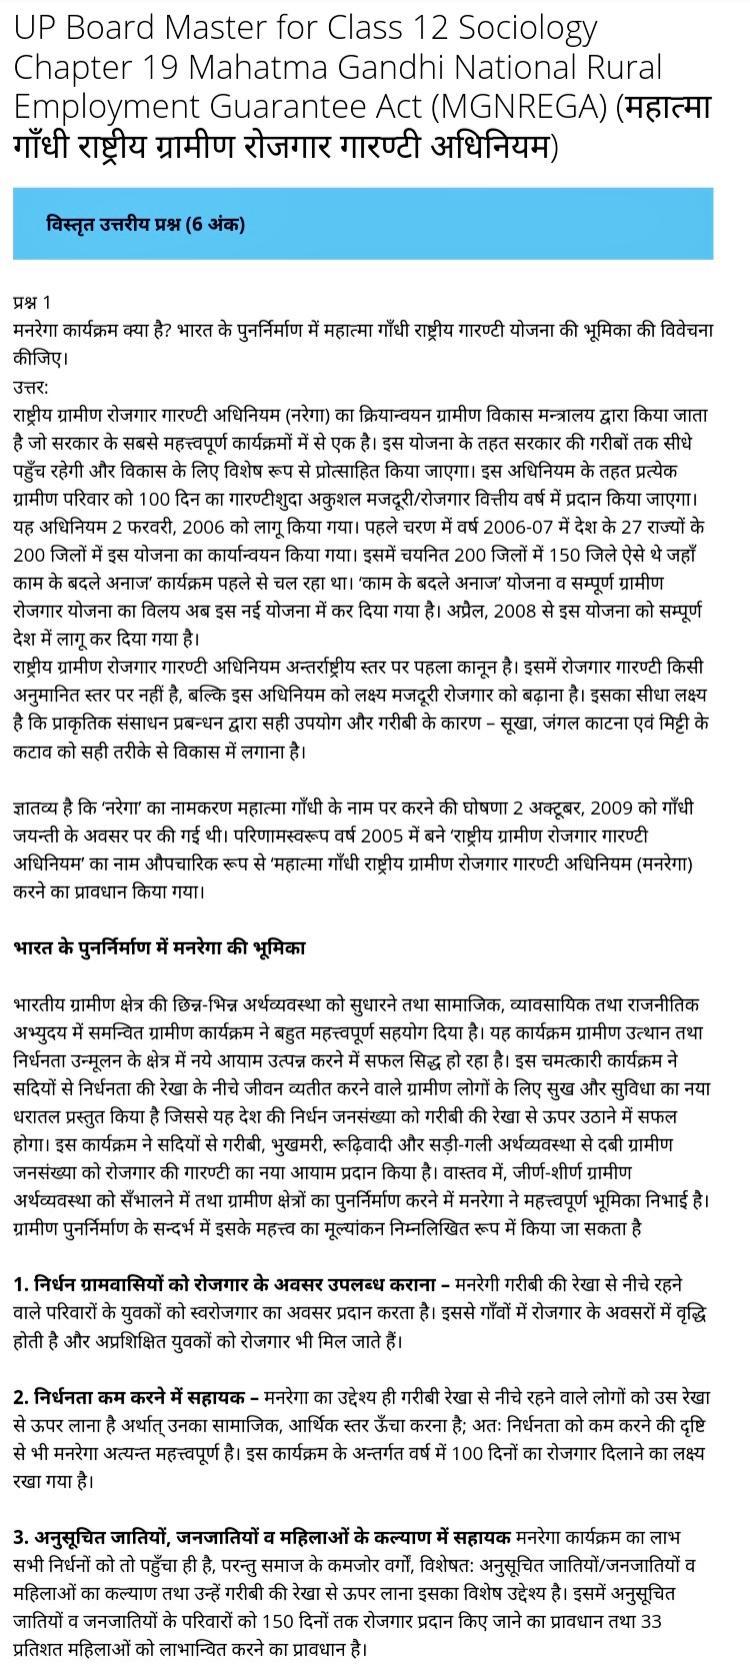 UP Board Solutions for Class 12 Sociology Chapter 19 Mahatma Gandhi National Rural Employment Guarantee Act (MGNREGA) (महात्मा गाँधी राष्ट्रीय ग्रामीण रोजगार गारण्टी अधिनियम)